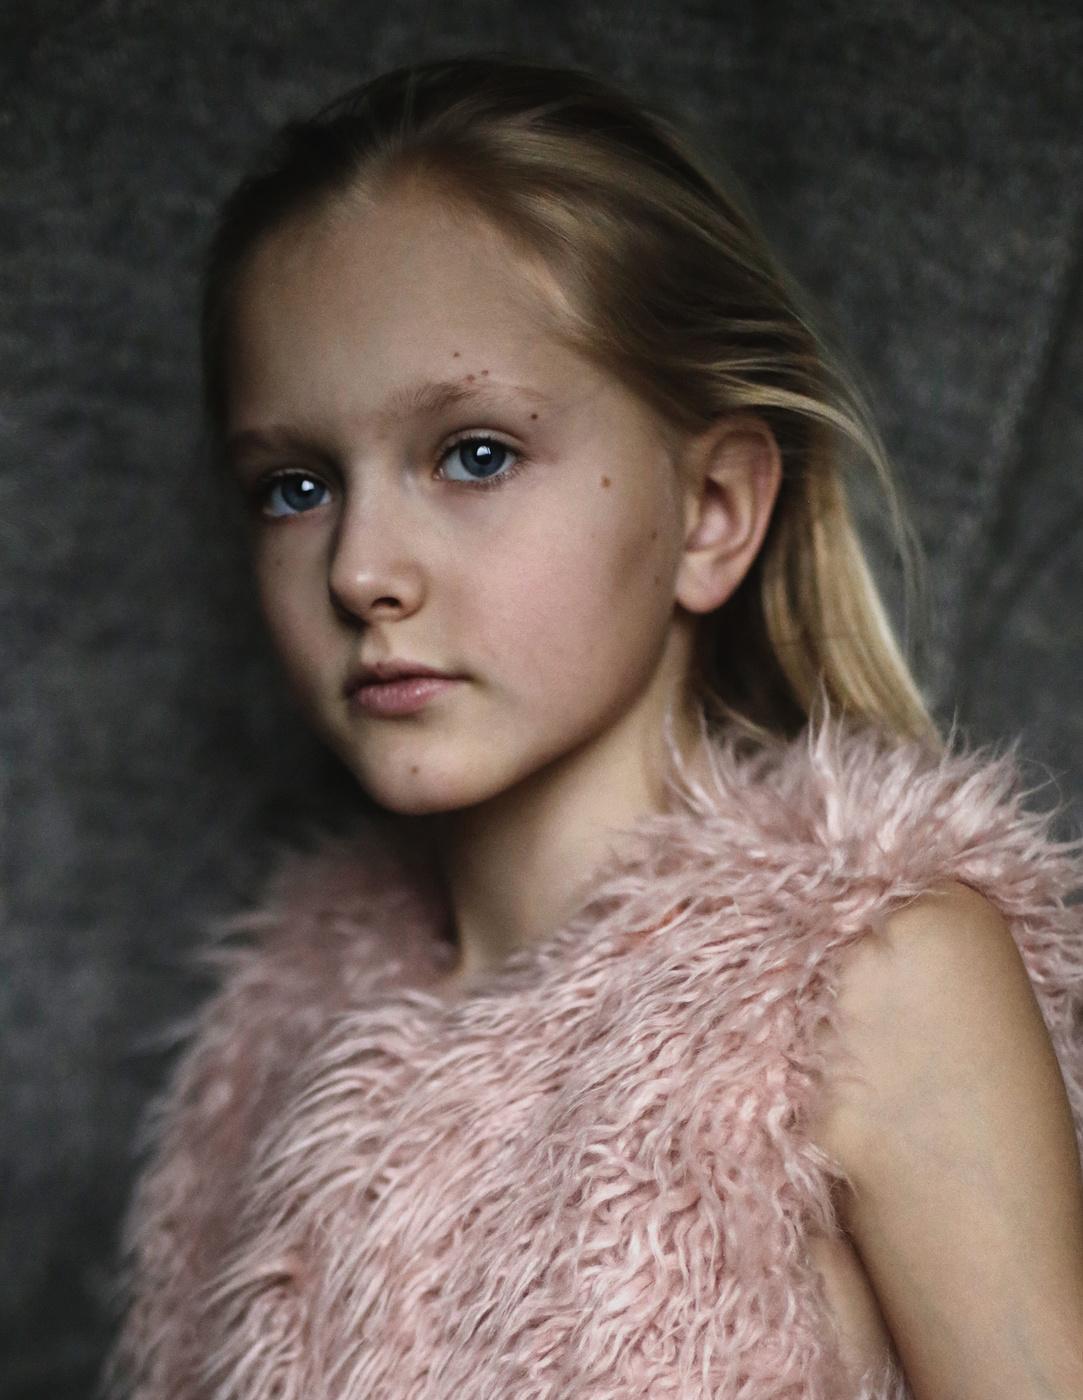 Сюзанна бэк фото автора